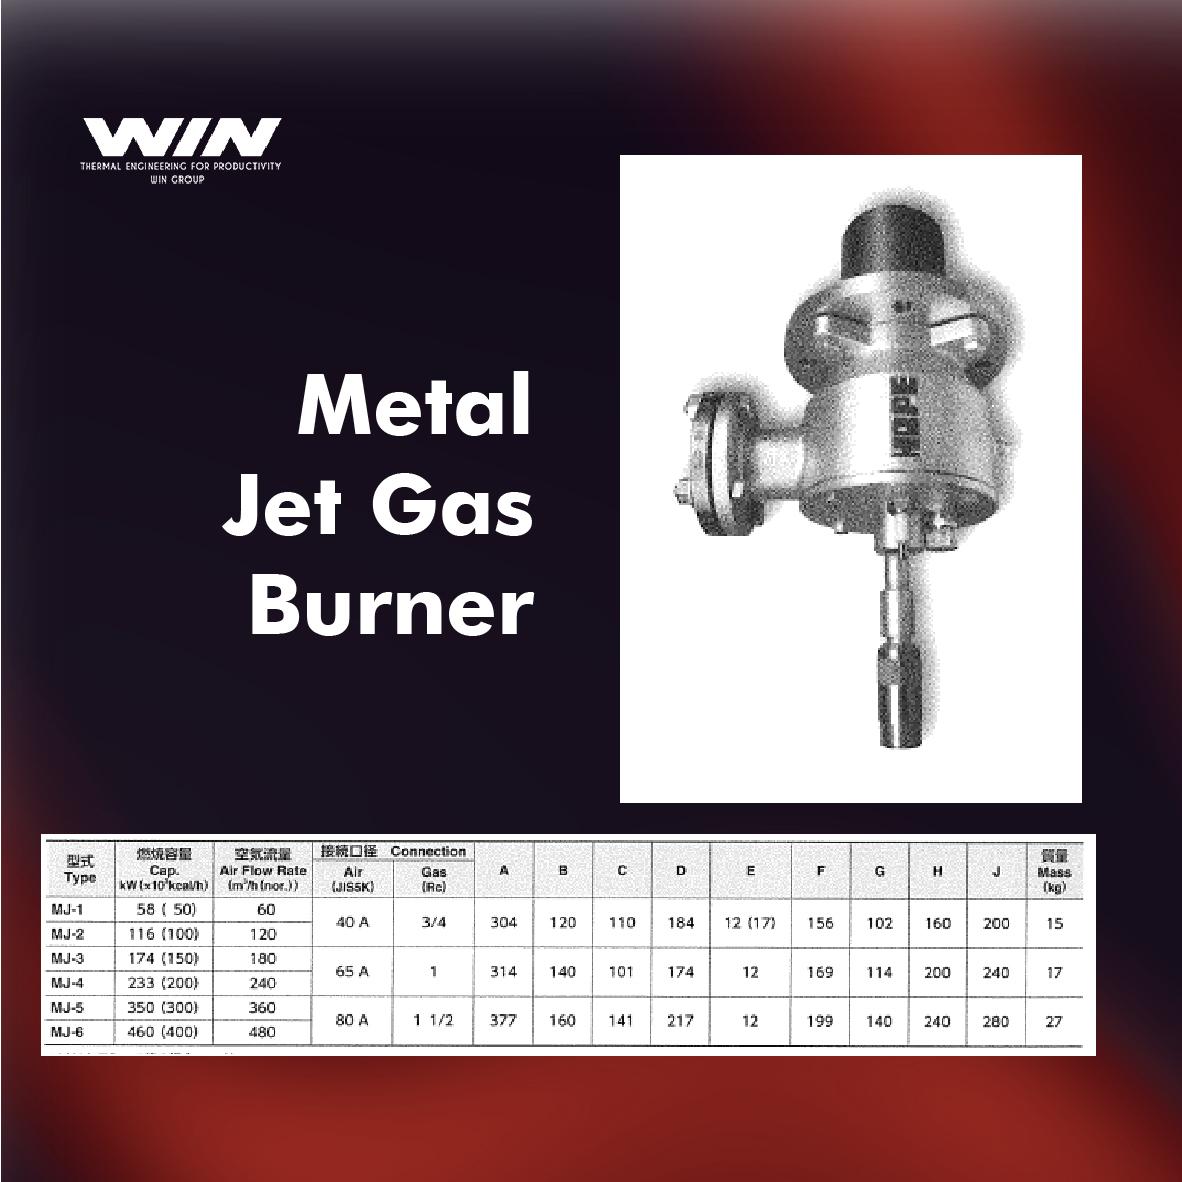 BURNER - WIN-22